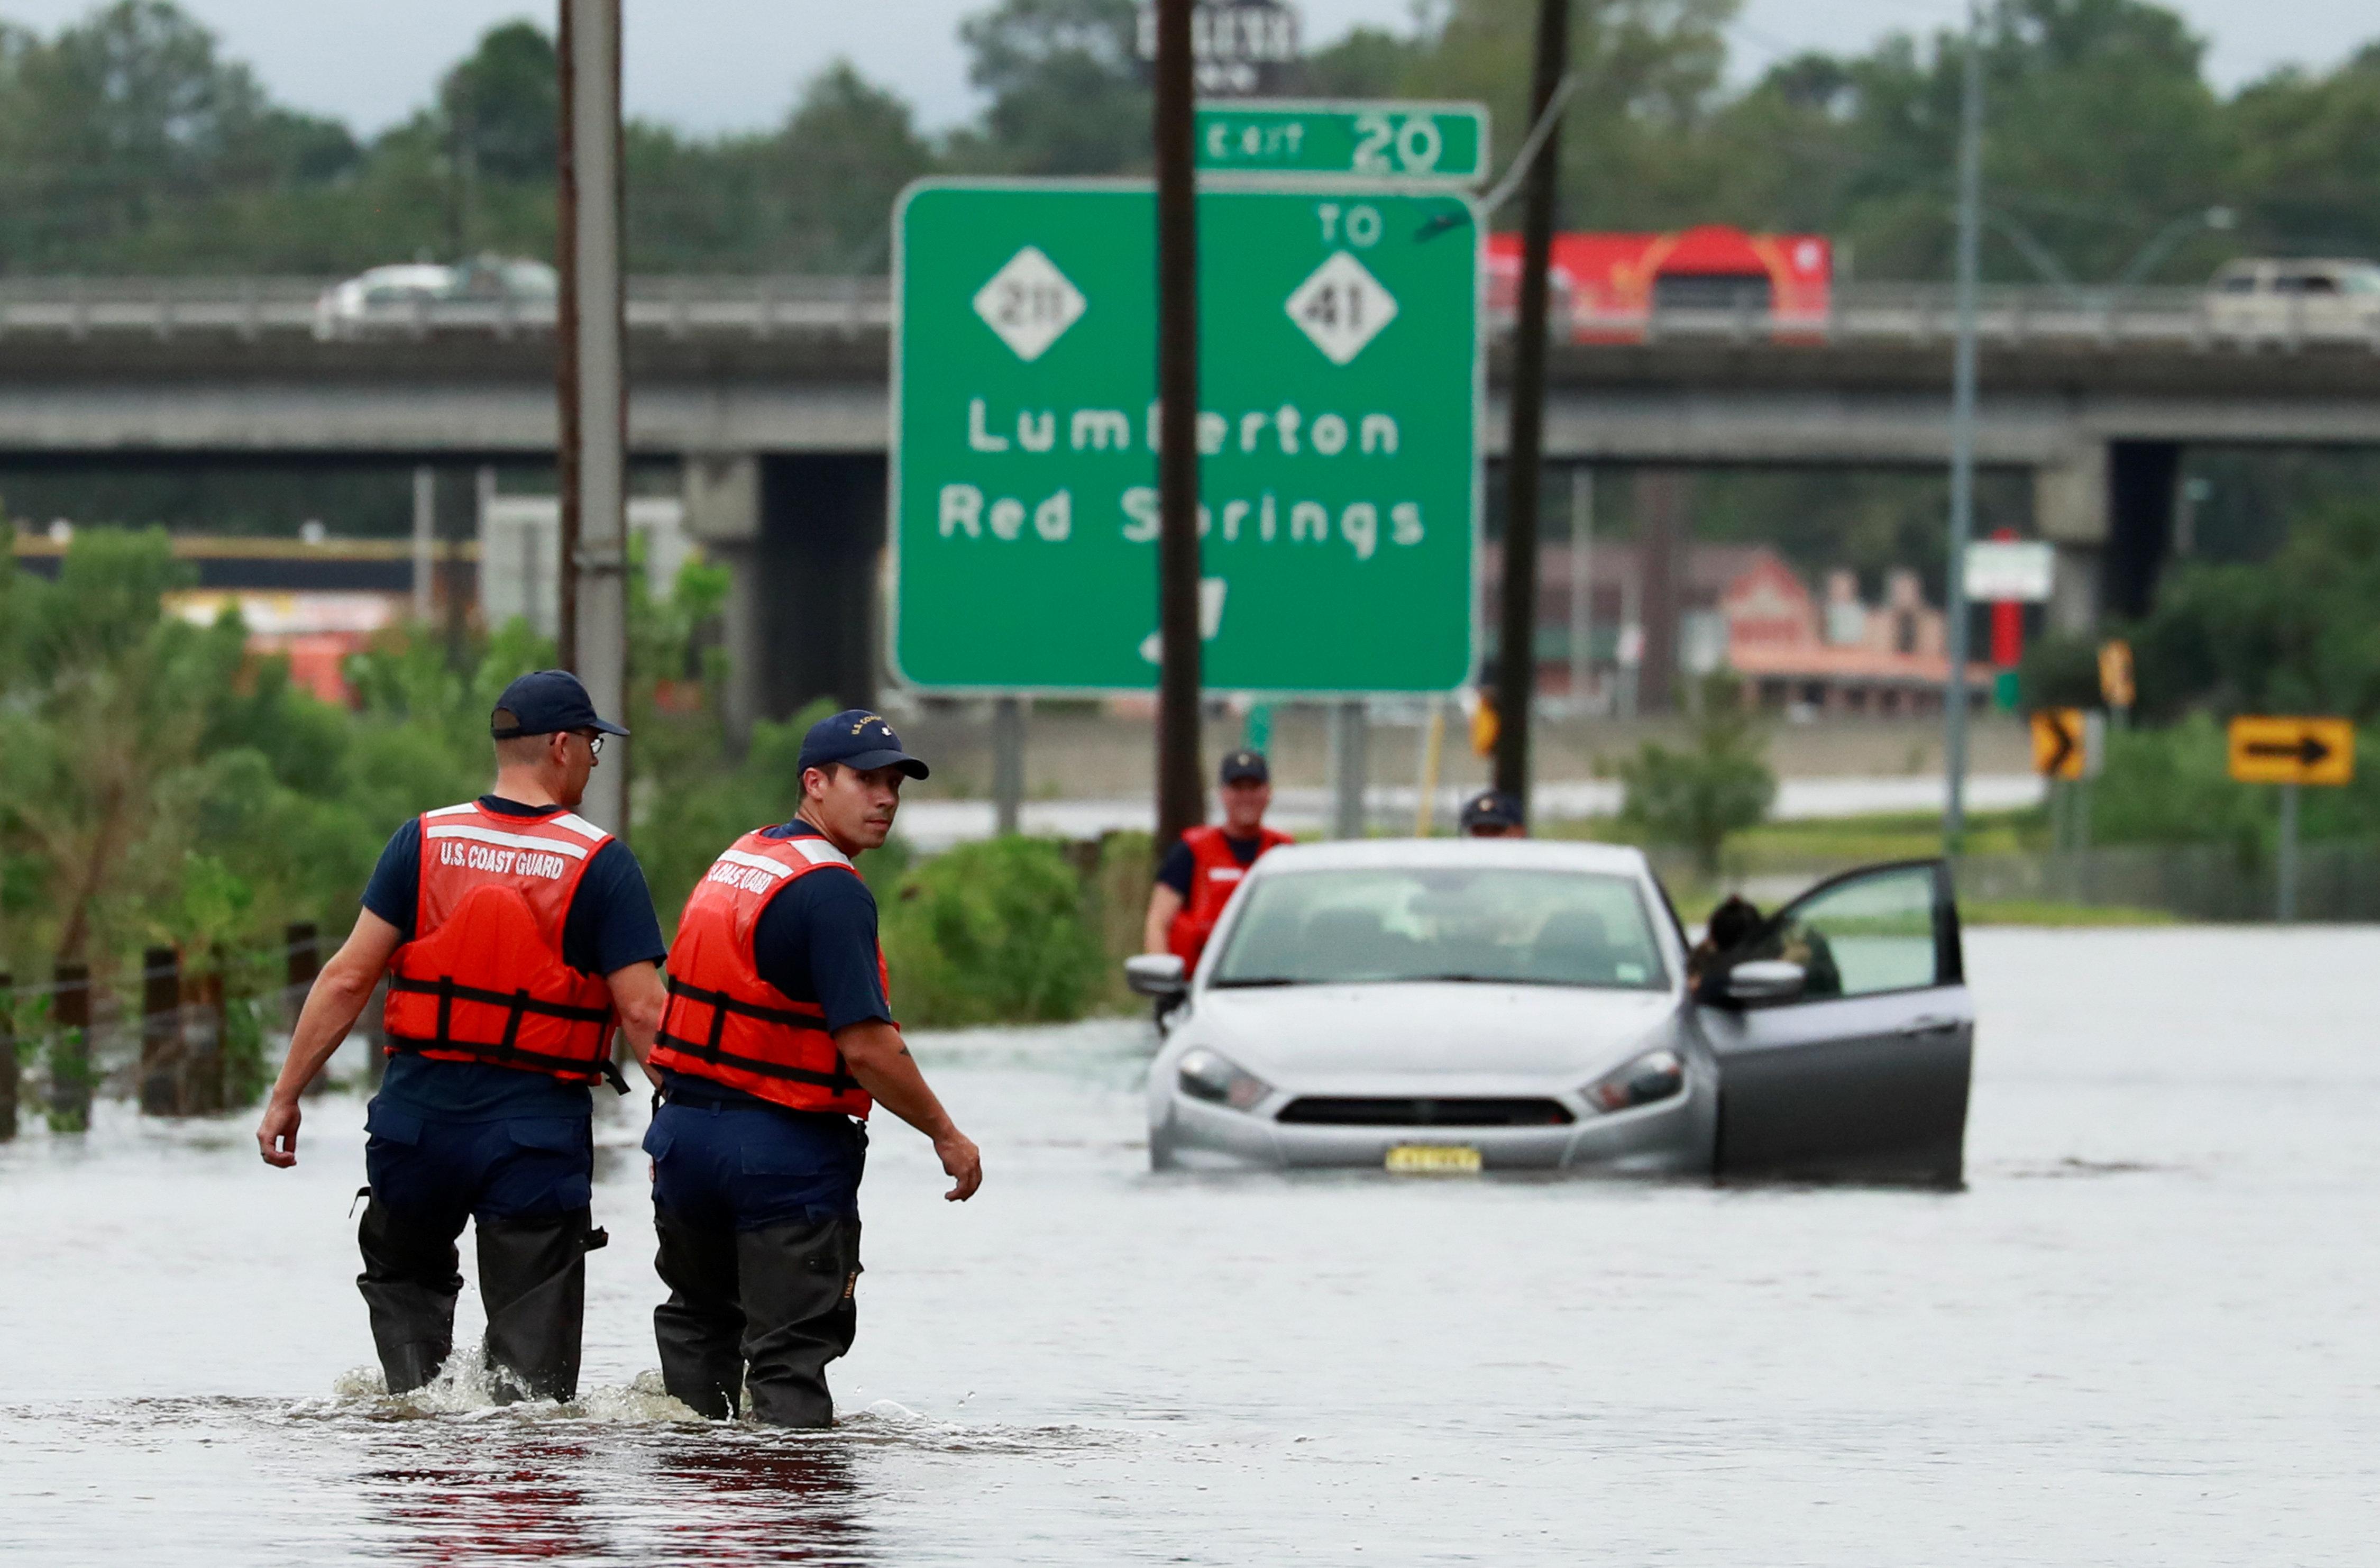 Members of the Coast Guard help a stranded motorist in the flood waters caused by Hurricane Florence in Lumberton, North Carolina, U.S. September 16, 2018. REUTERS/Jason Miczek